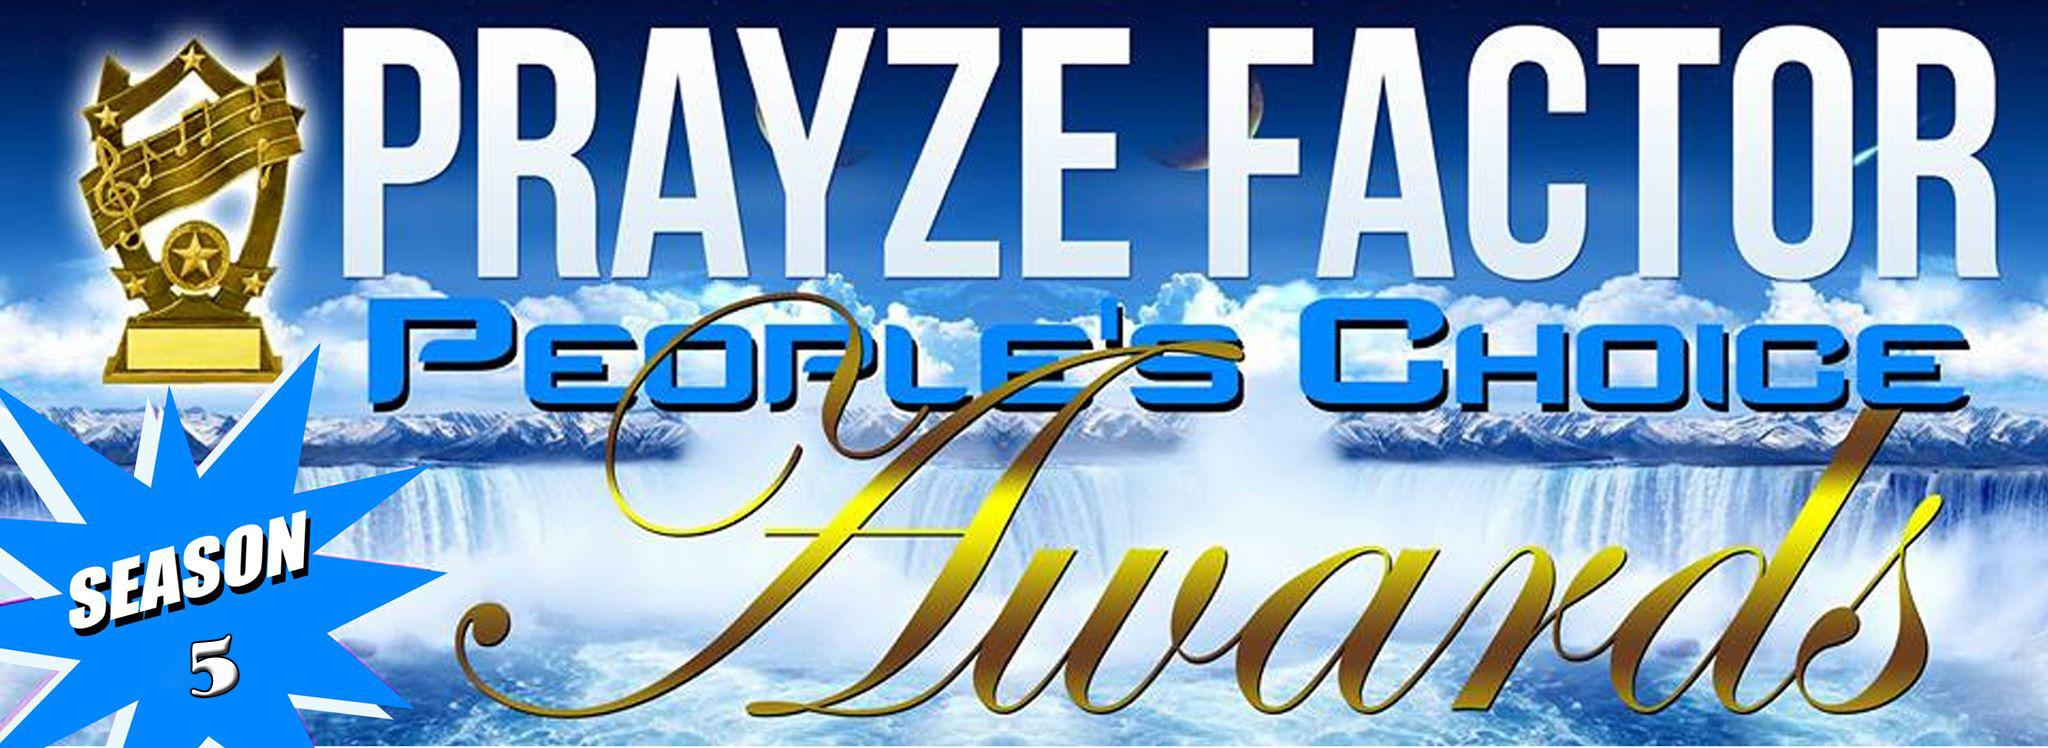 Prayze Factor Season 5